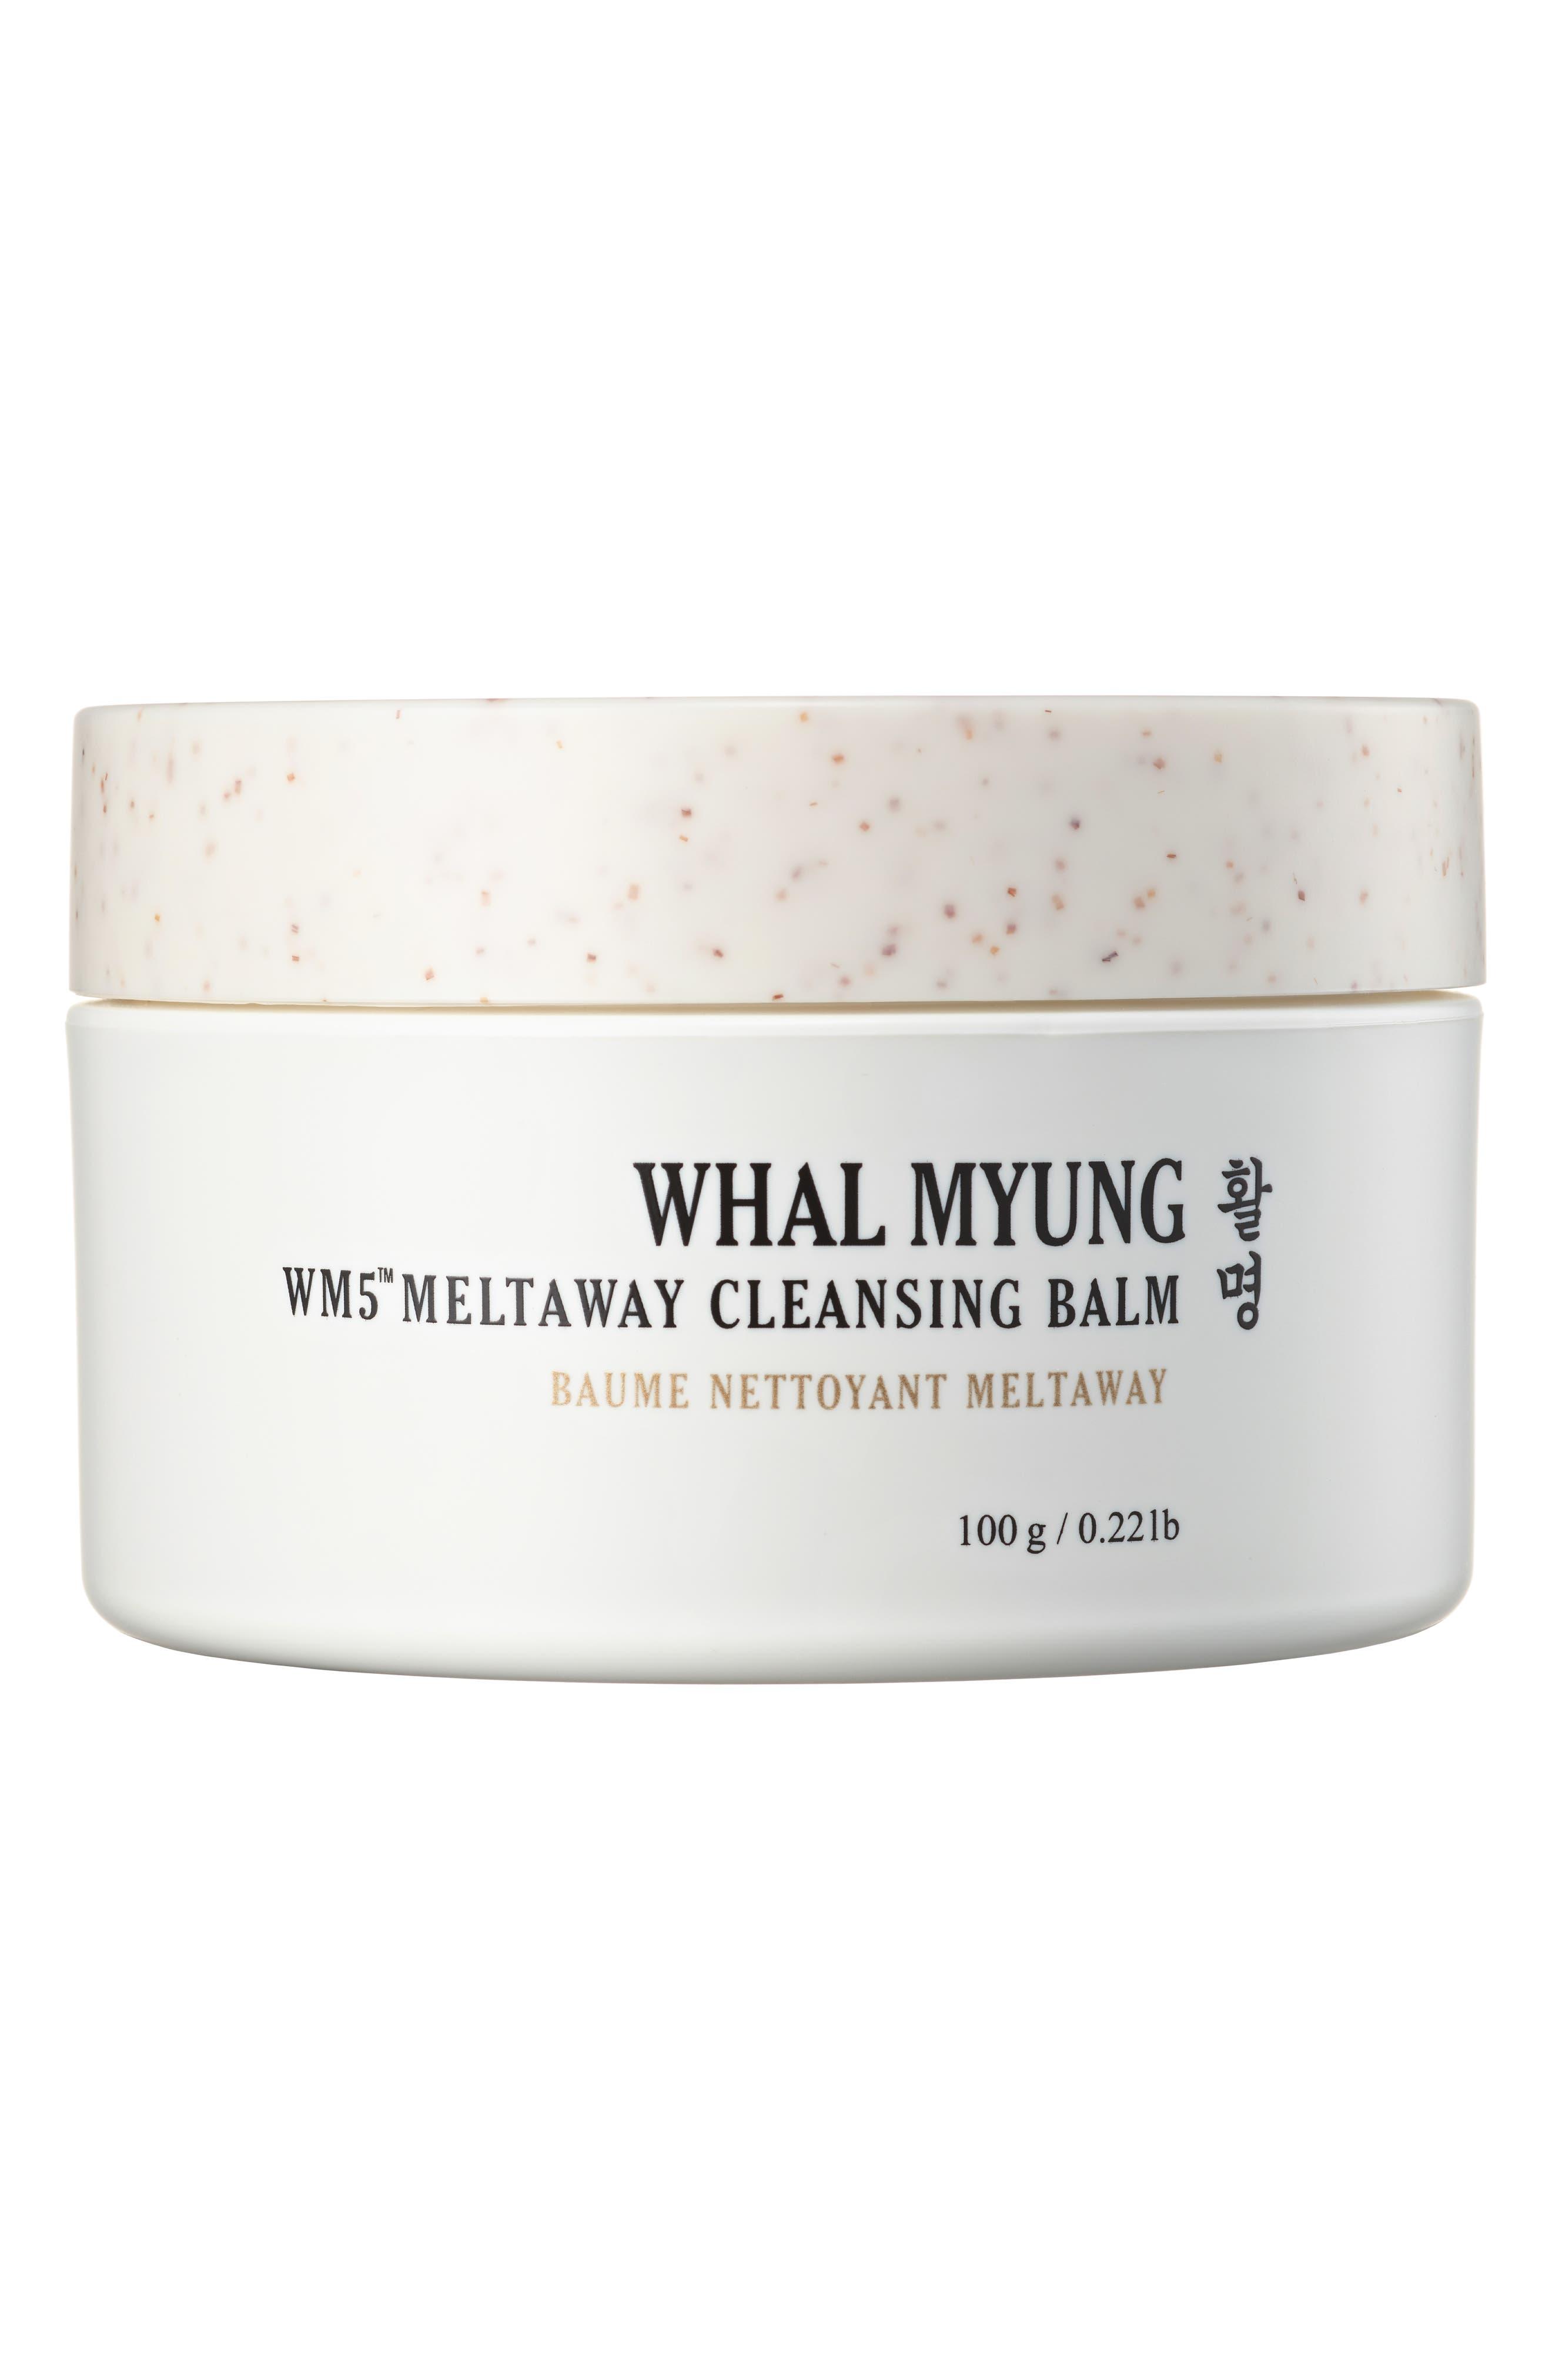 Meltaway Cleansing Balm,                             Main thumbnail 1, color,                             NO COLOR